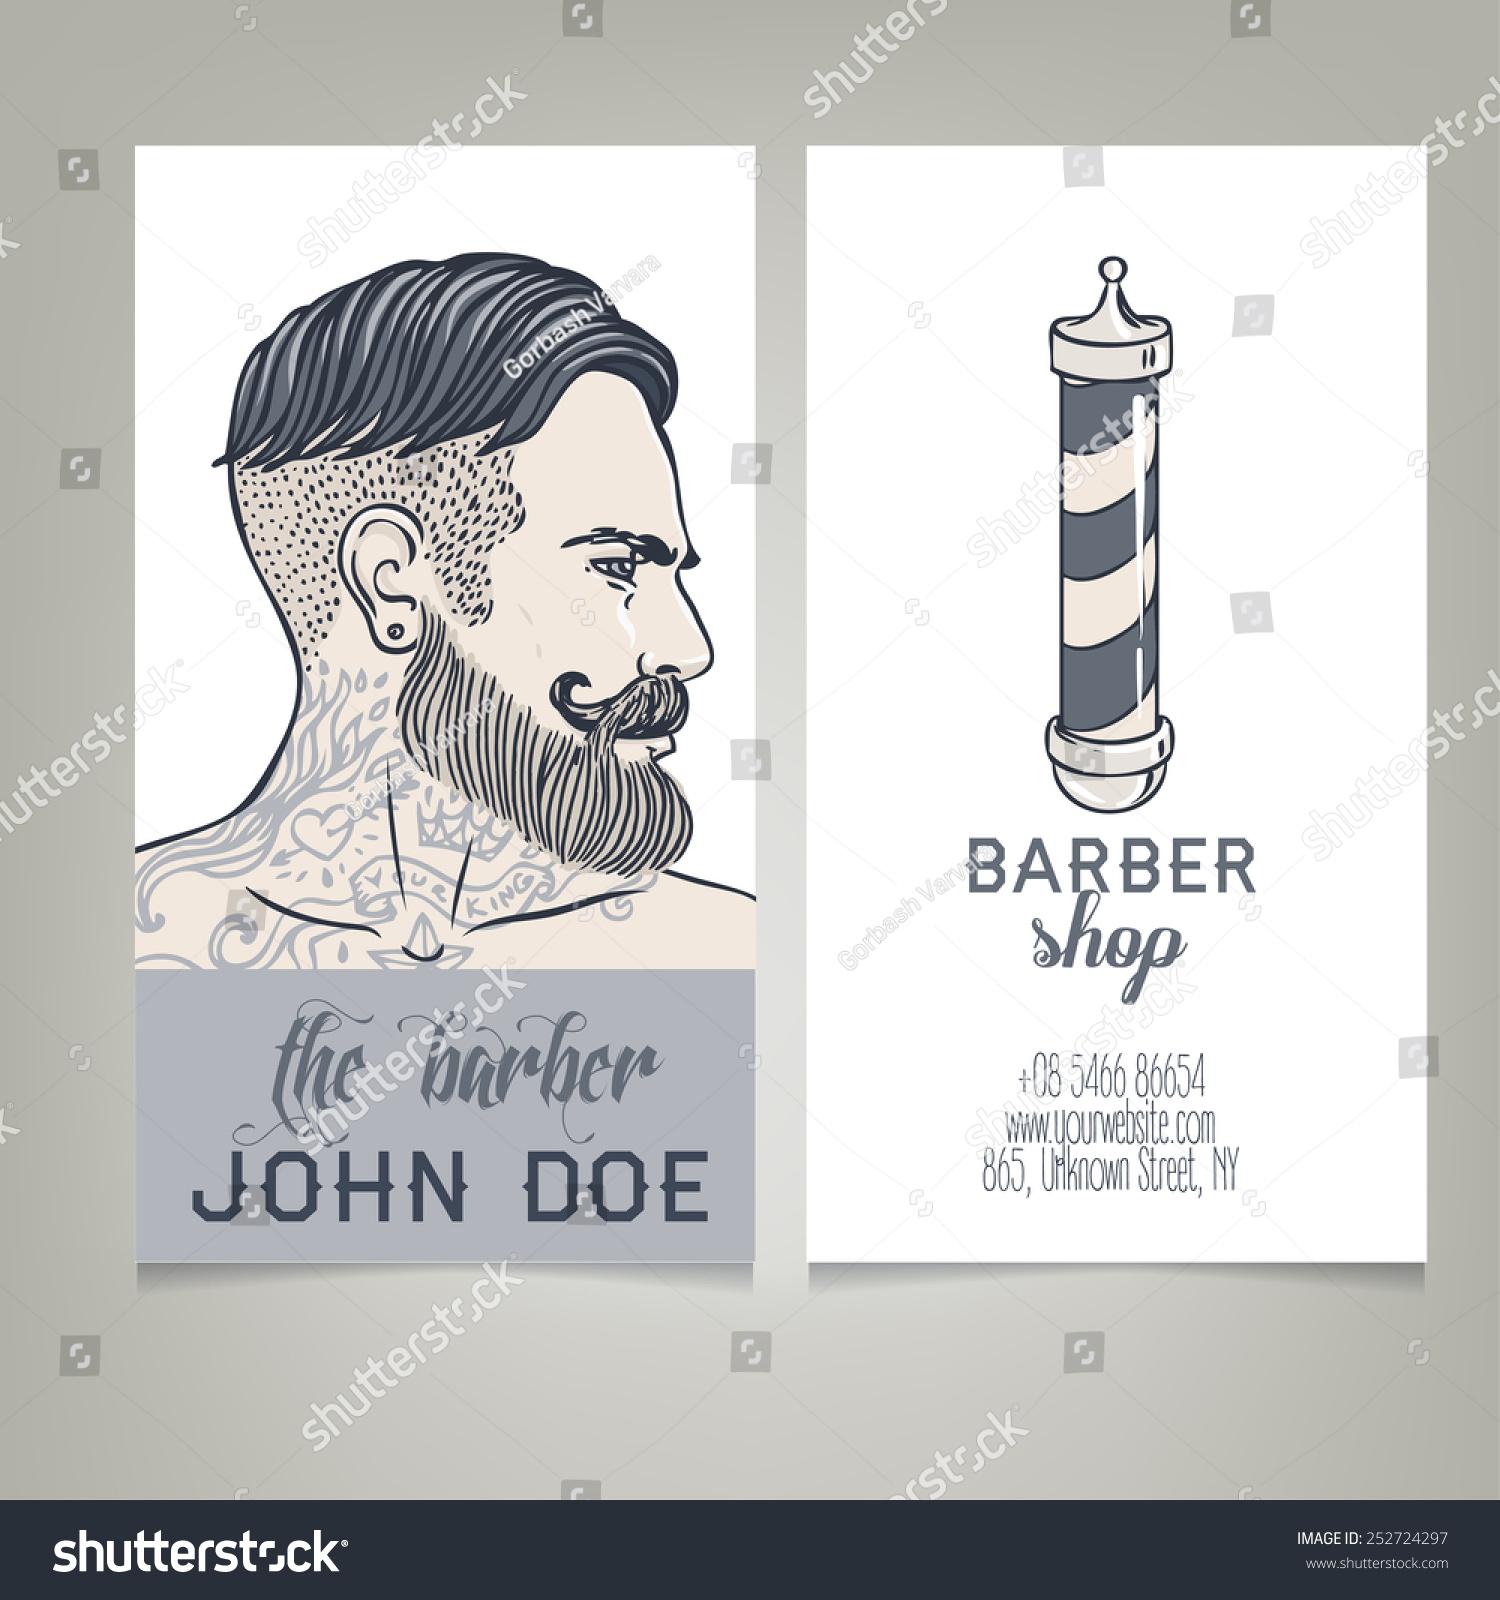 Hipster Barber Shop Business Card Design Stock Vector 252724297 ...